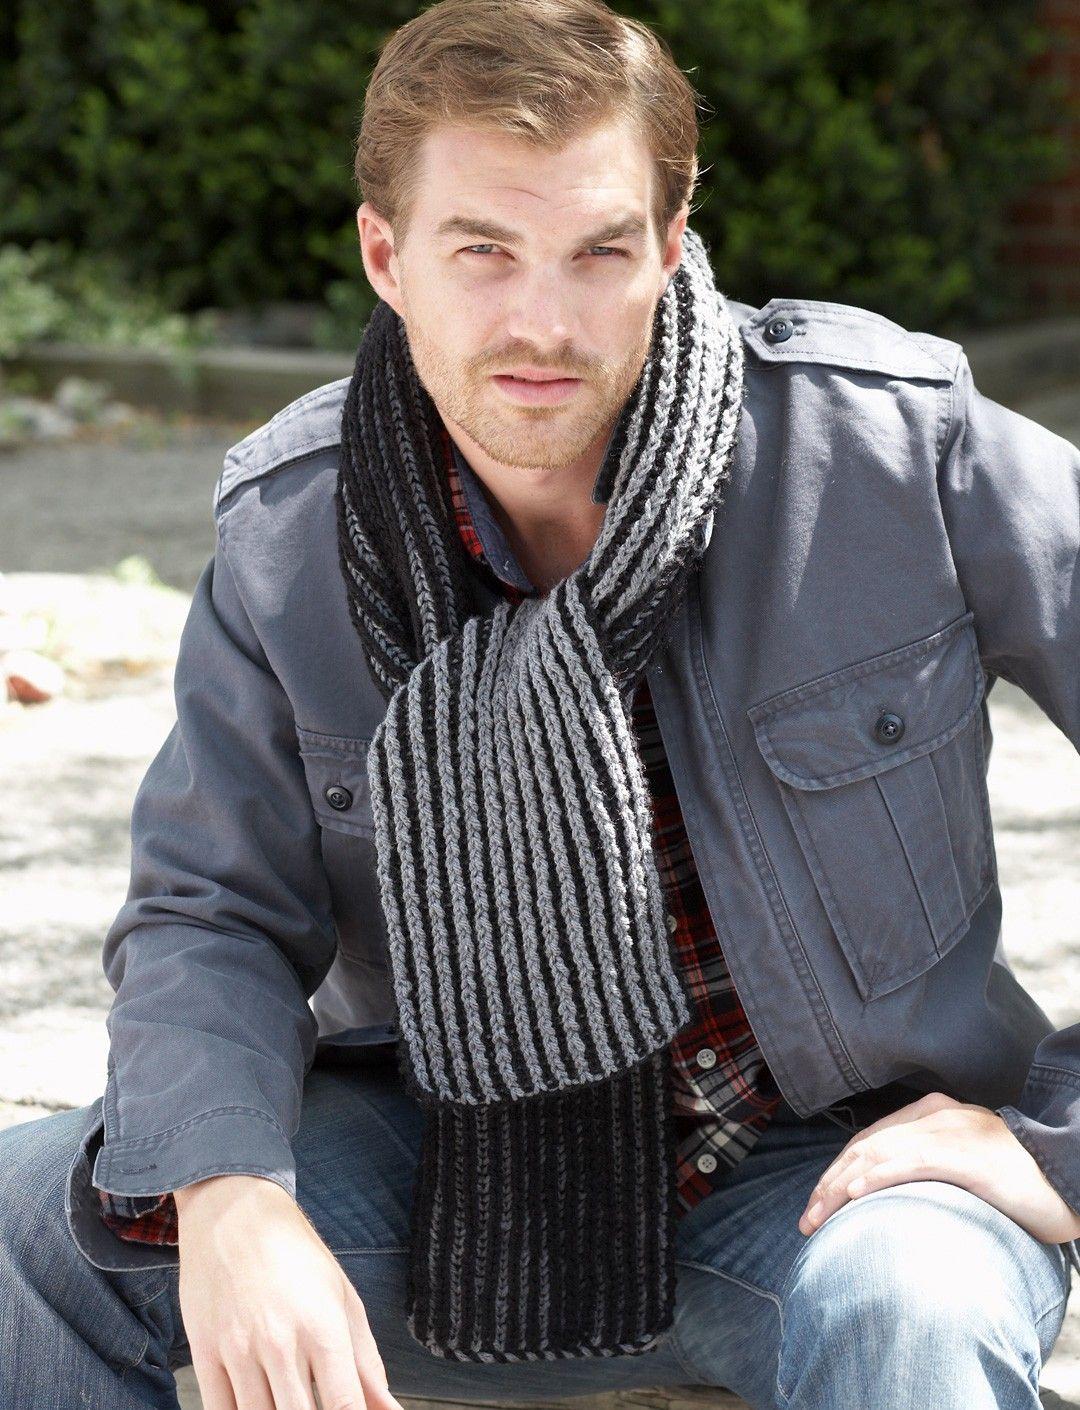 Yarnspirations bernat brioche stitch scarves patterns bundle up in these cozy knit brioche stitch scarves for men and boys shown in bernat super value bankloansurffo Gallery